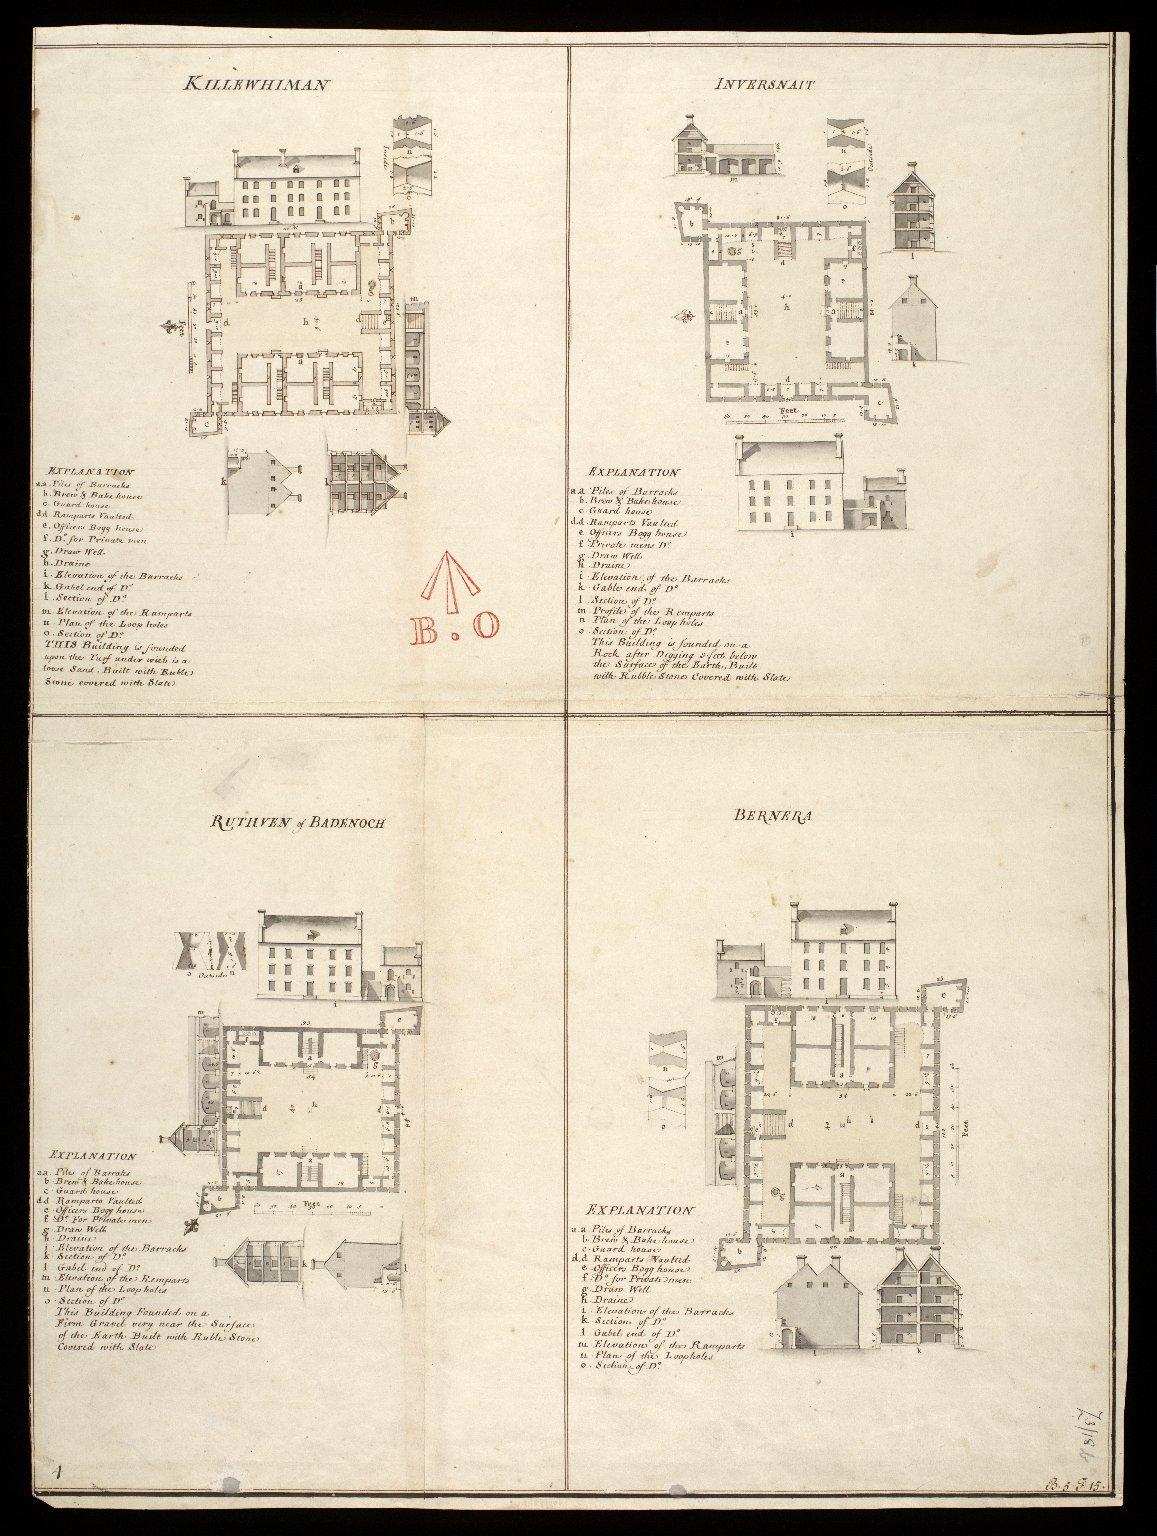 Killewhiman [i.e. Kiliwhimen], Inversnait [i.e. Inversnaid], Ruthven of Badenoch, Bernera [1 of 1]